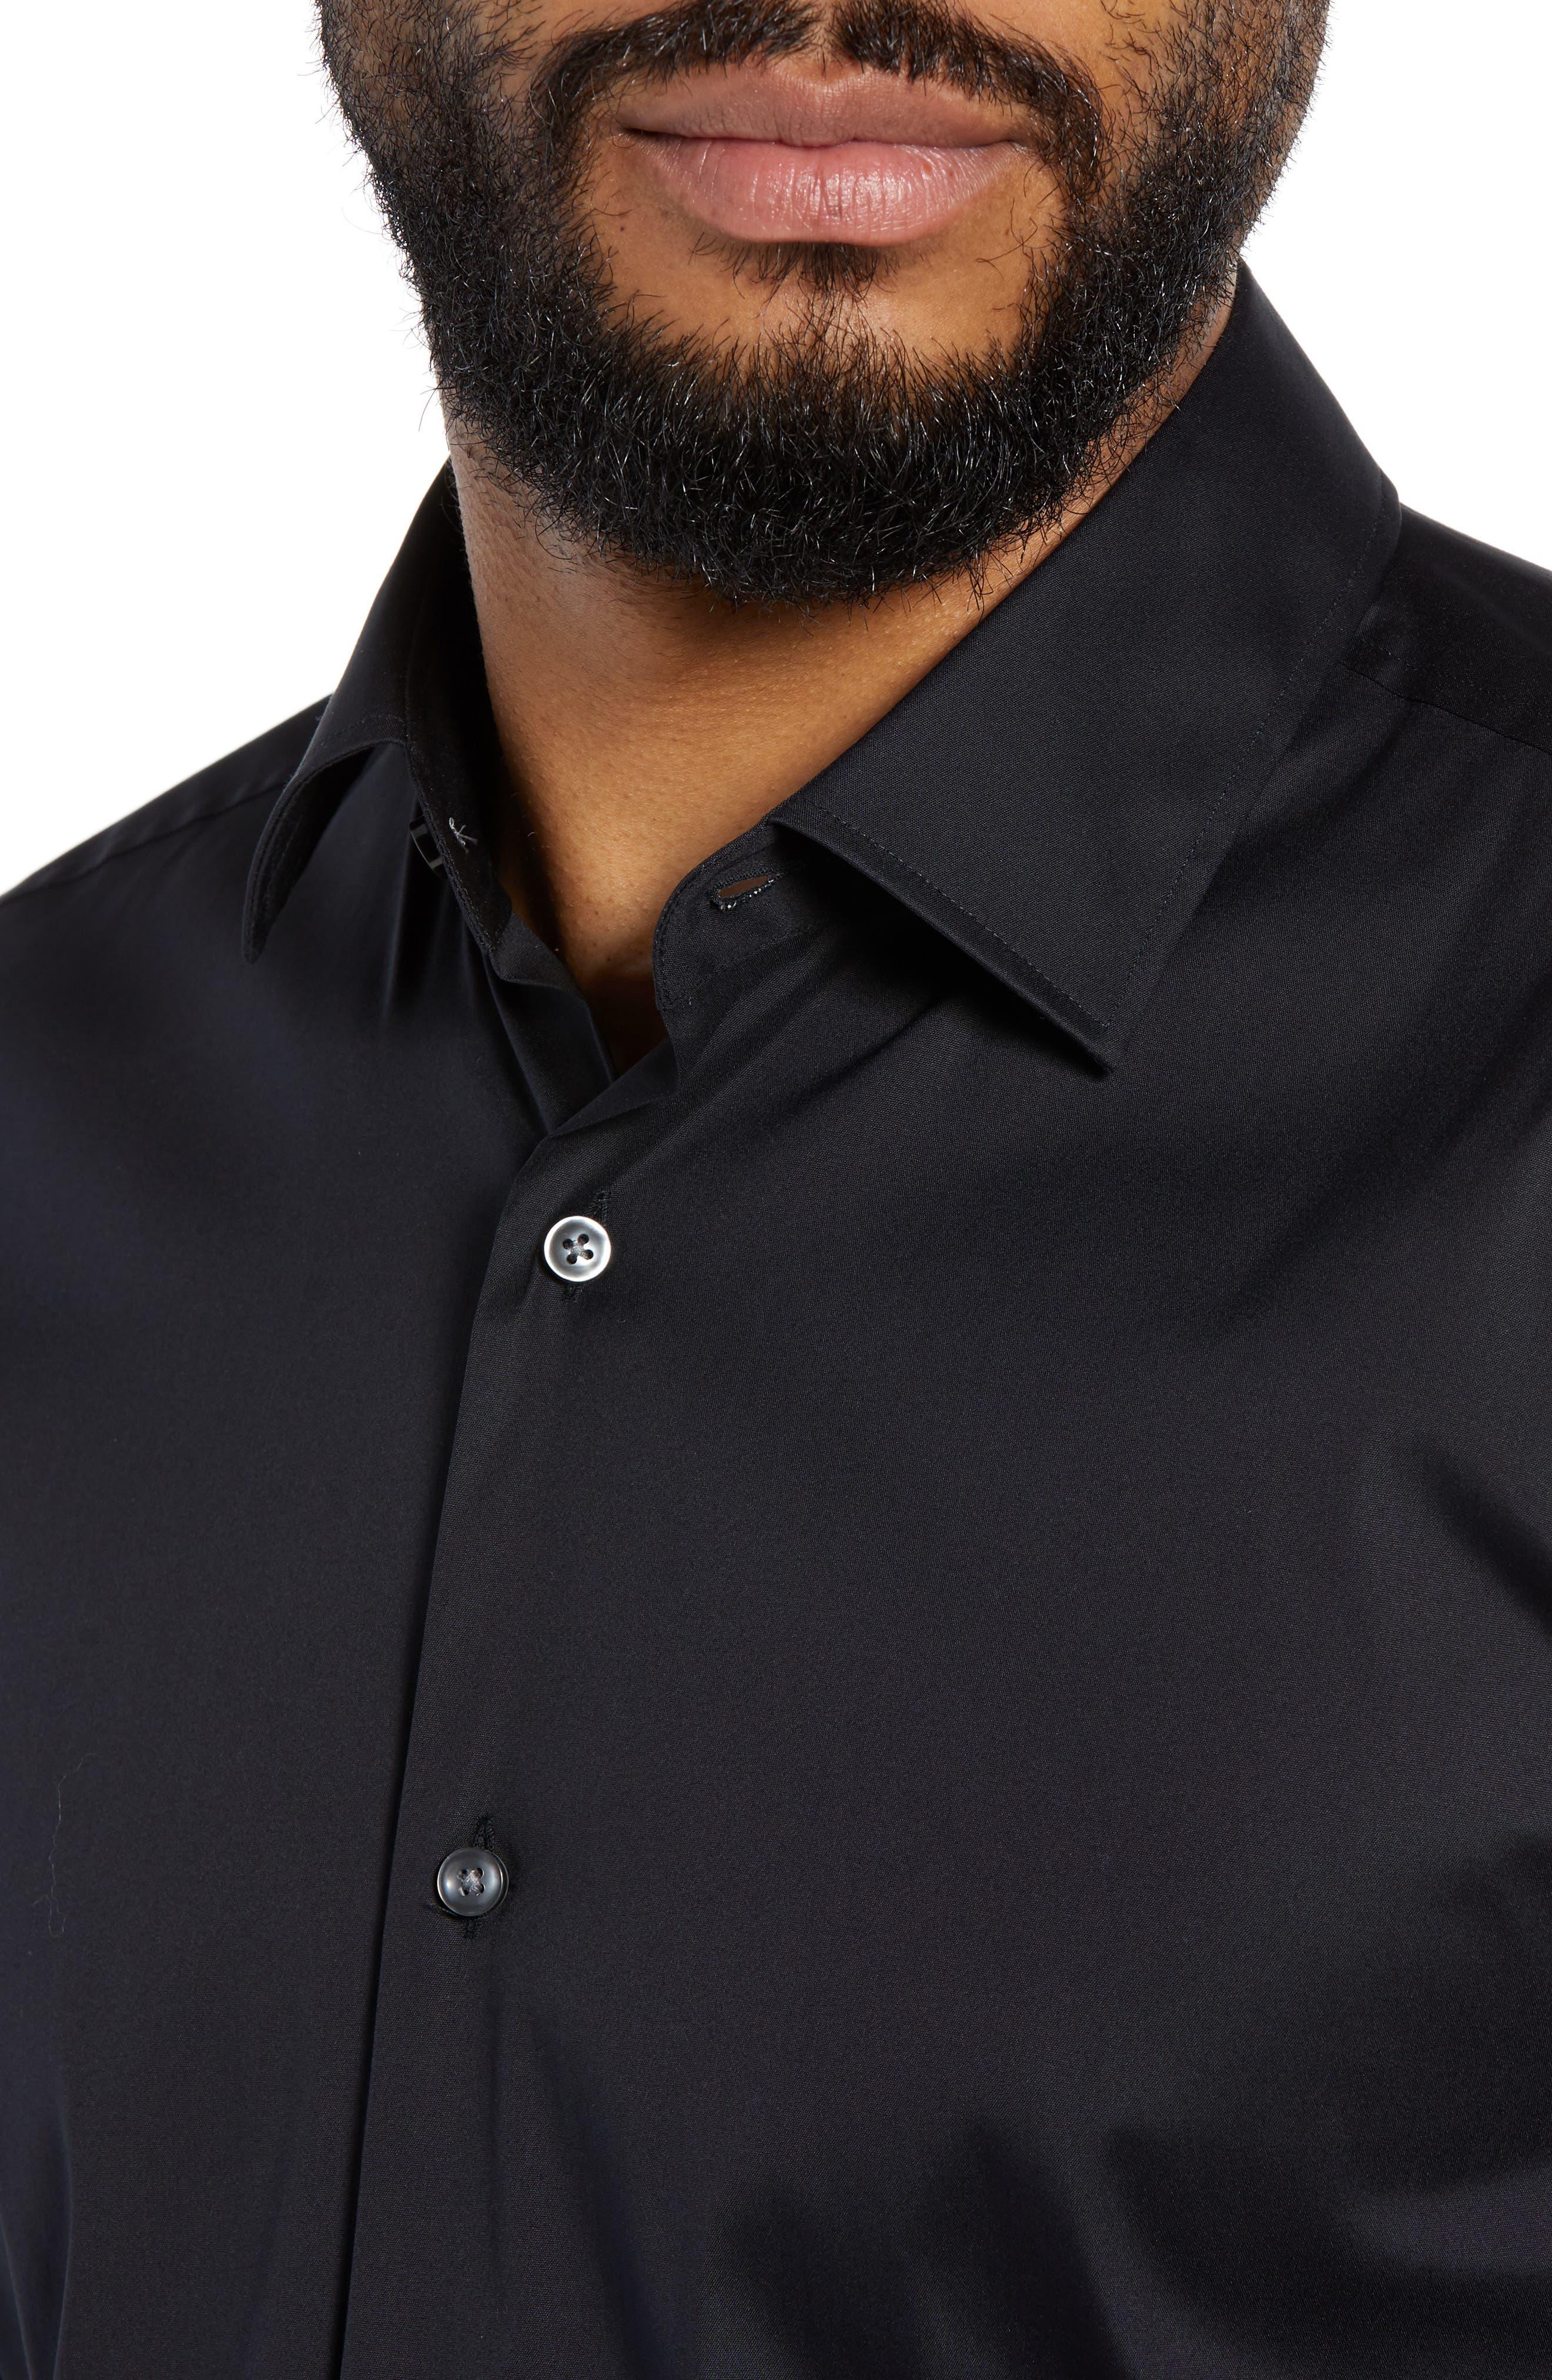 Jenno Slim Fit Stretch Solid Dress Shirt,                             Alternate thumbnail 2, color,                             BLACK